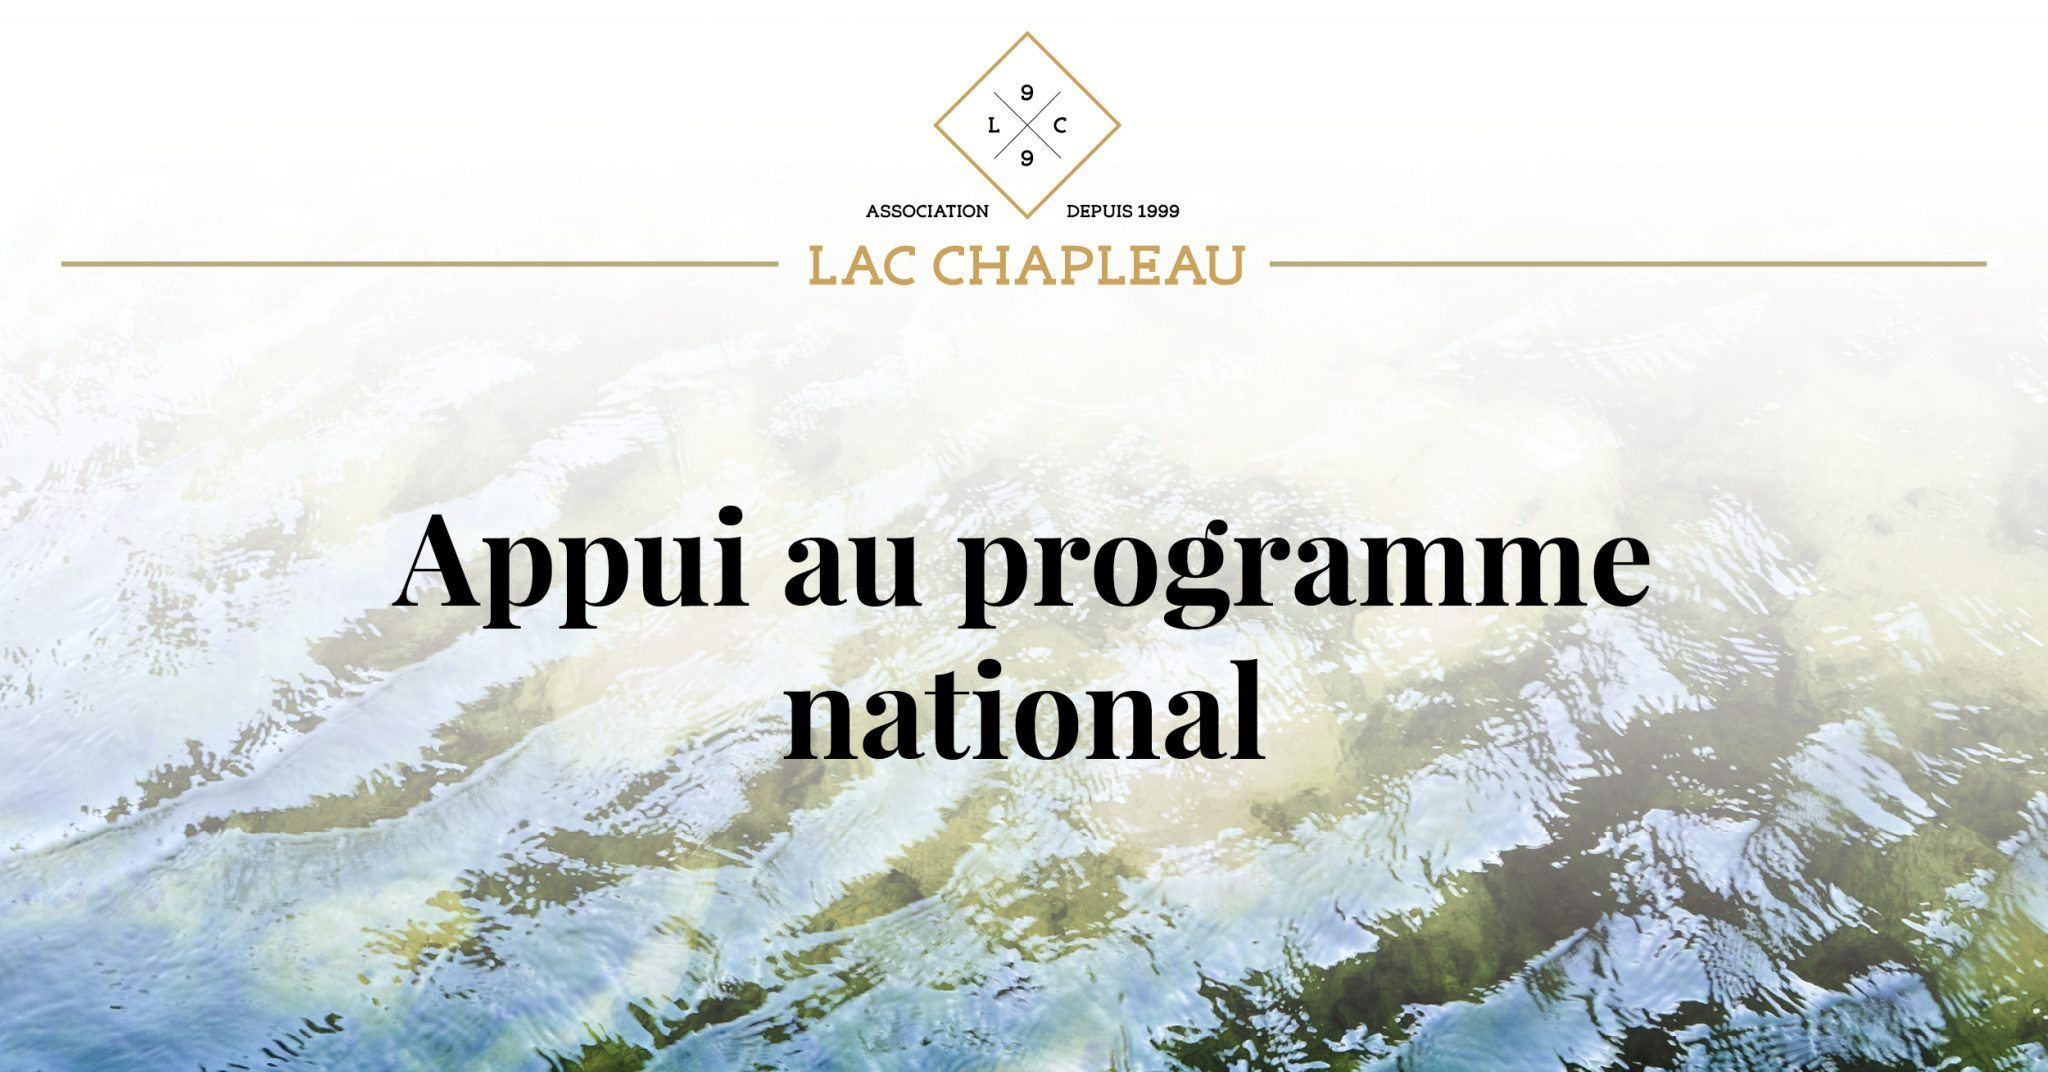 Appui au programme national